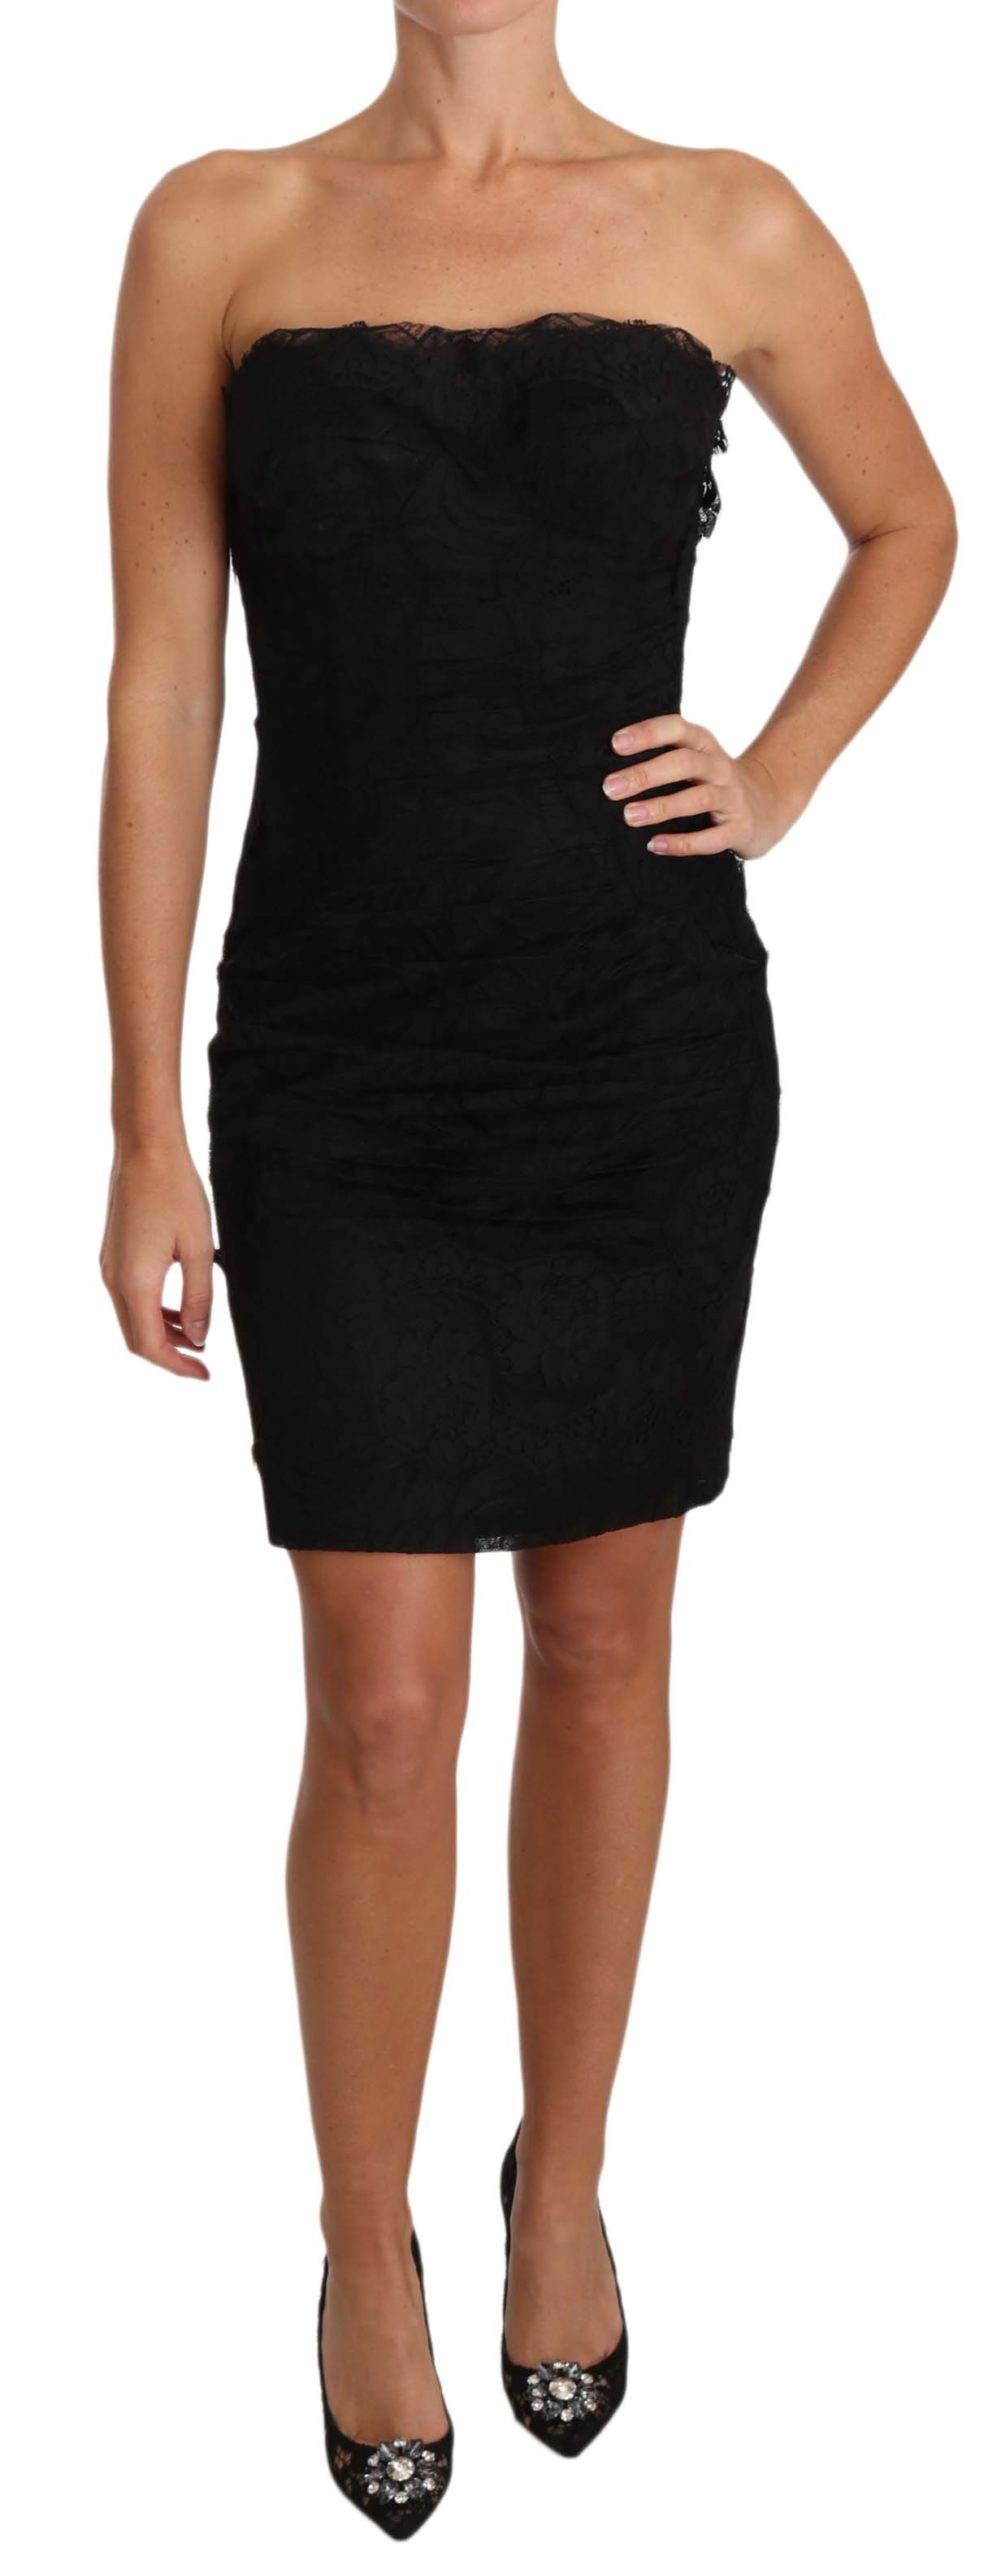 Dolce & Gabbana Women's Lace Strapless Mini Dress Black DR2021 - IT42|M